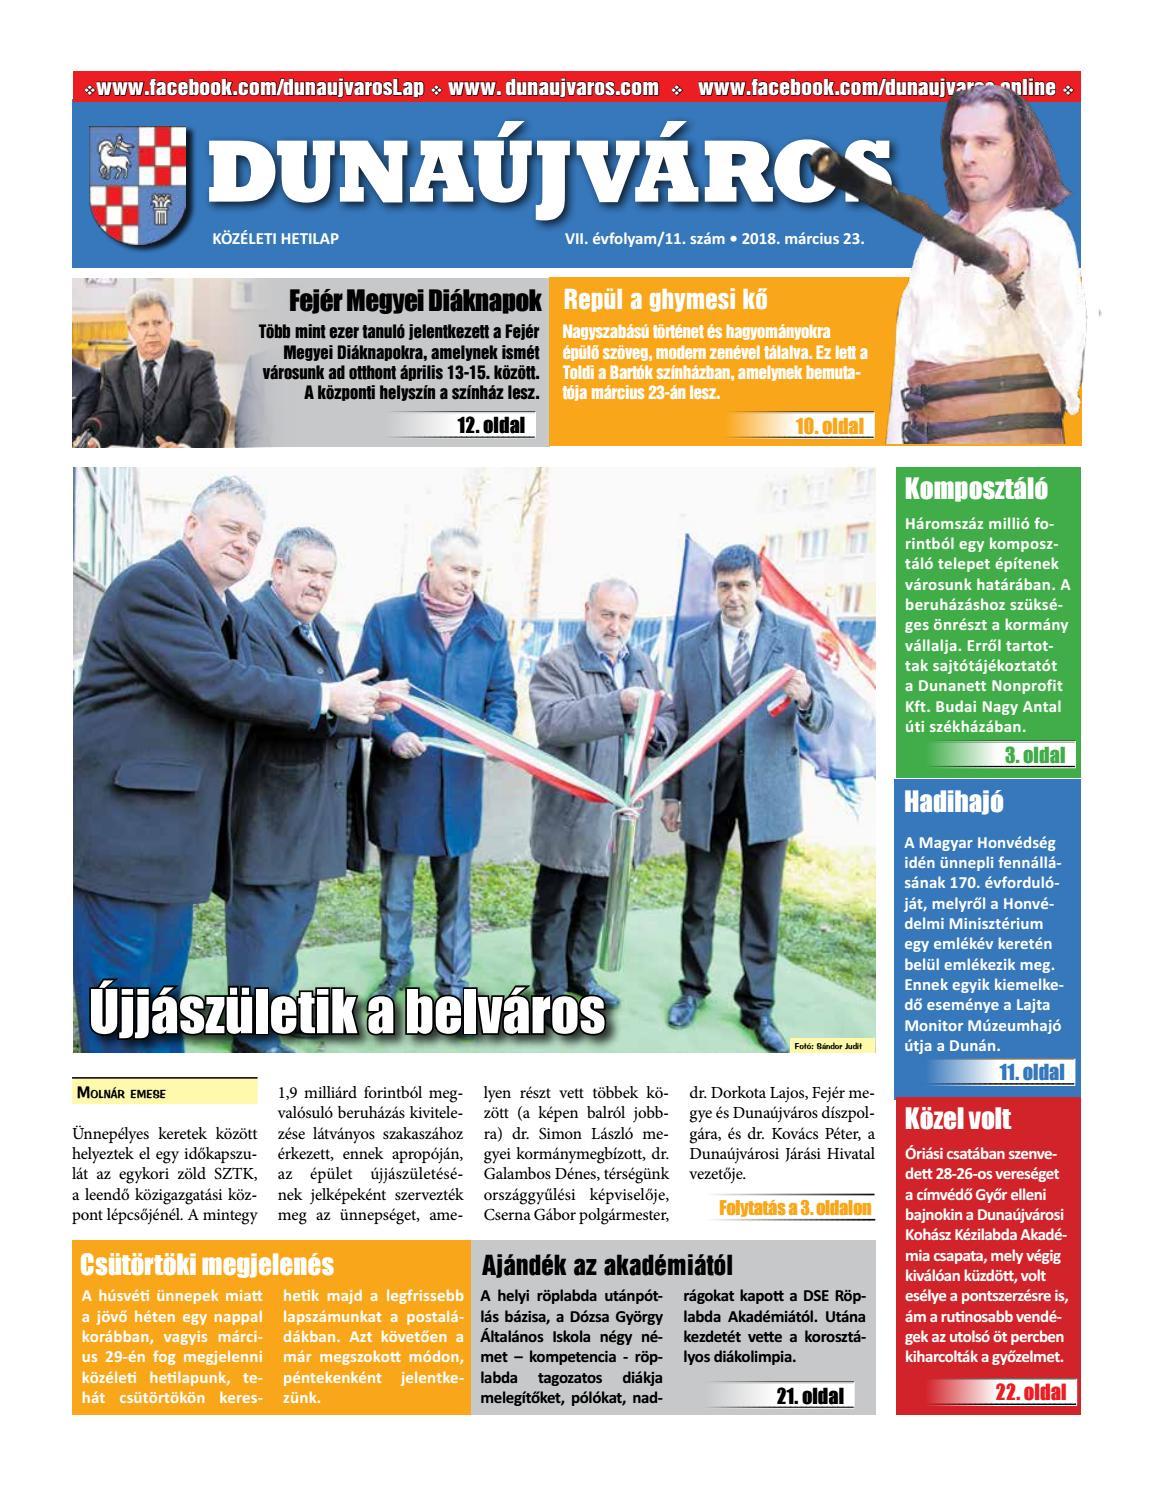 Dkh 2018 03 23 by Dunaújváros Közéleti Hetilapja - issuu 8924c143cd